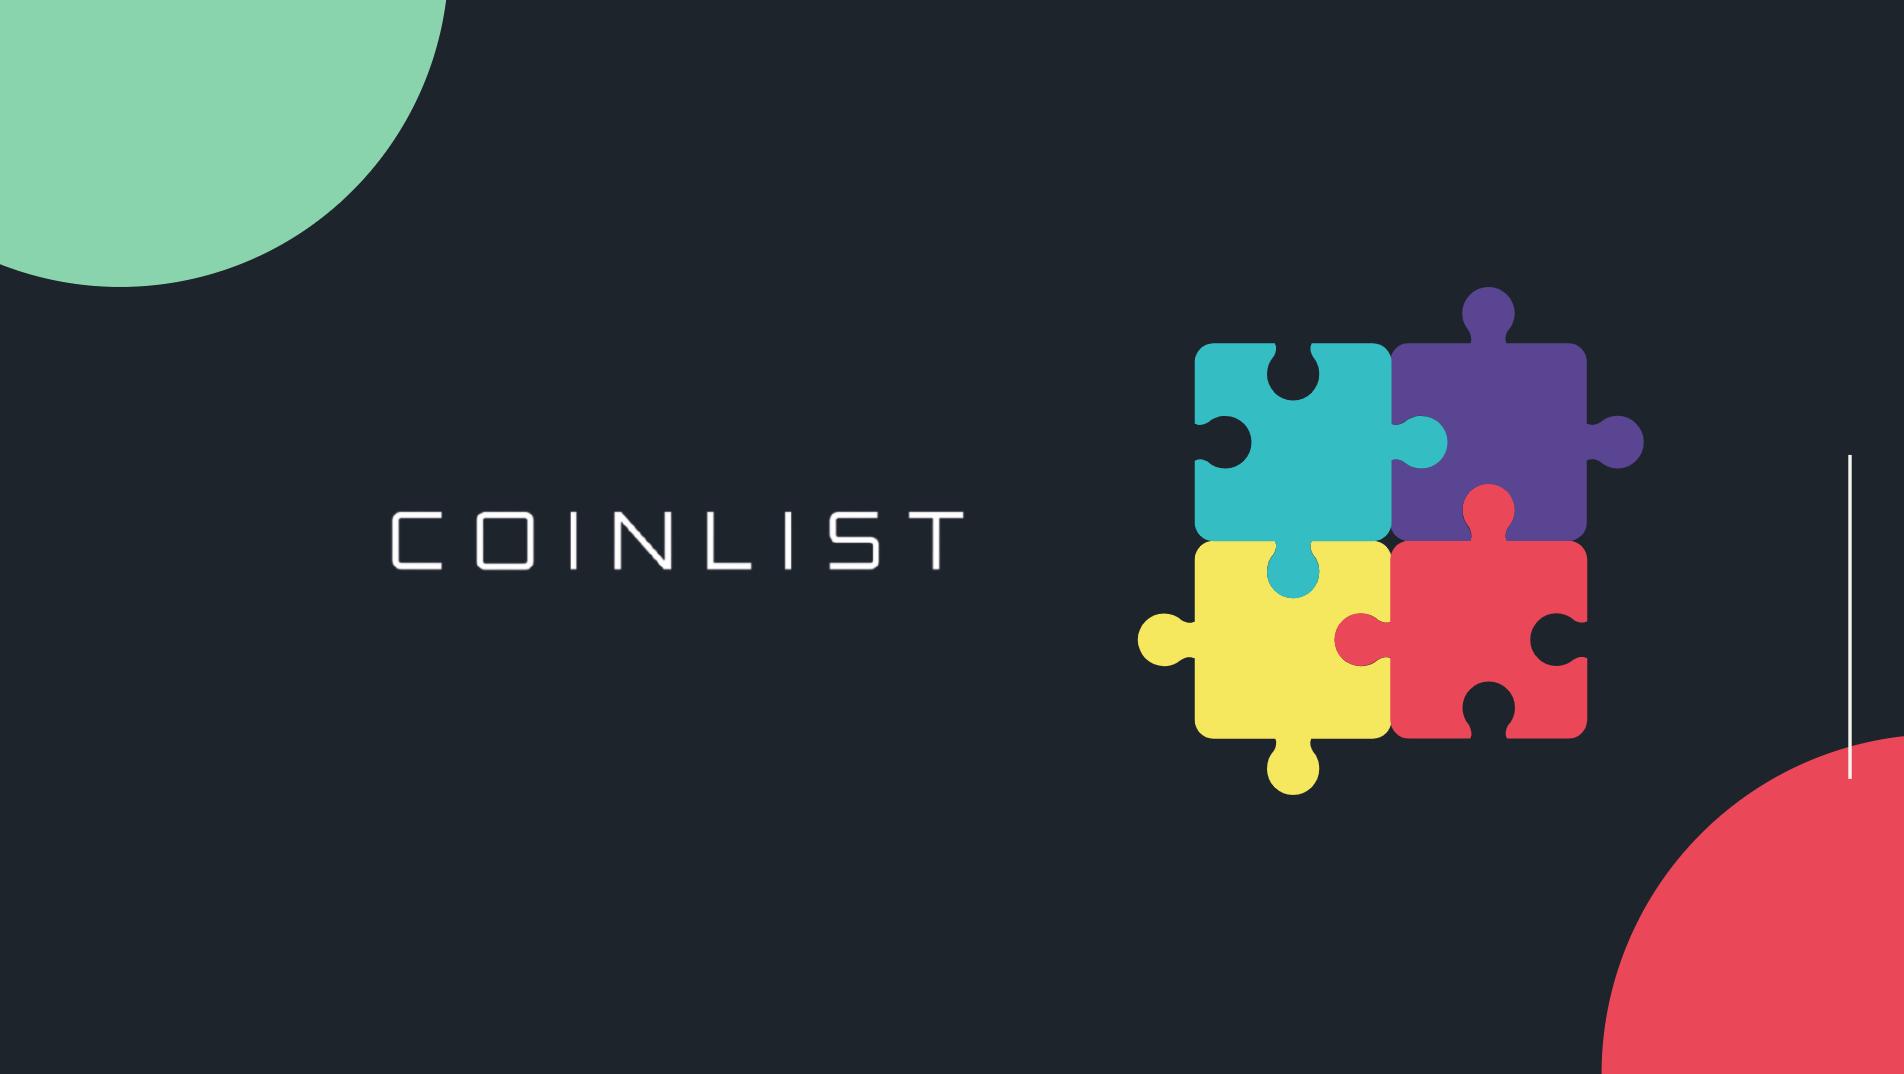 CoinListでトークンセールに参加しよう!メリットや登録方法を徹底解説!!